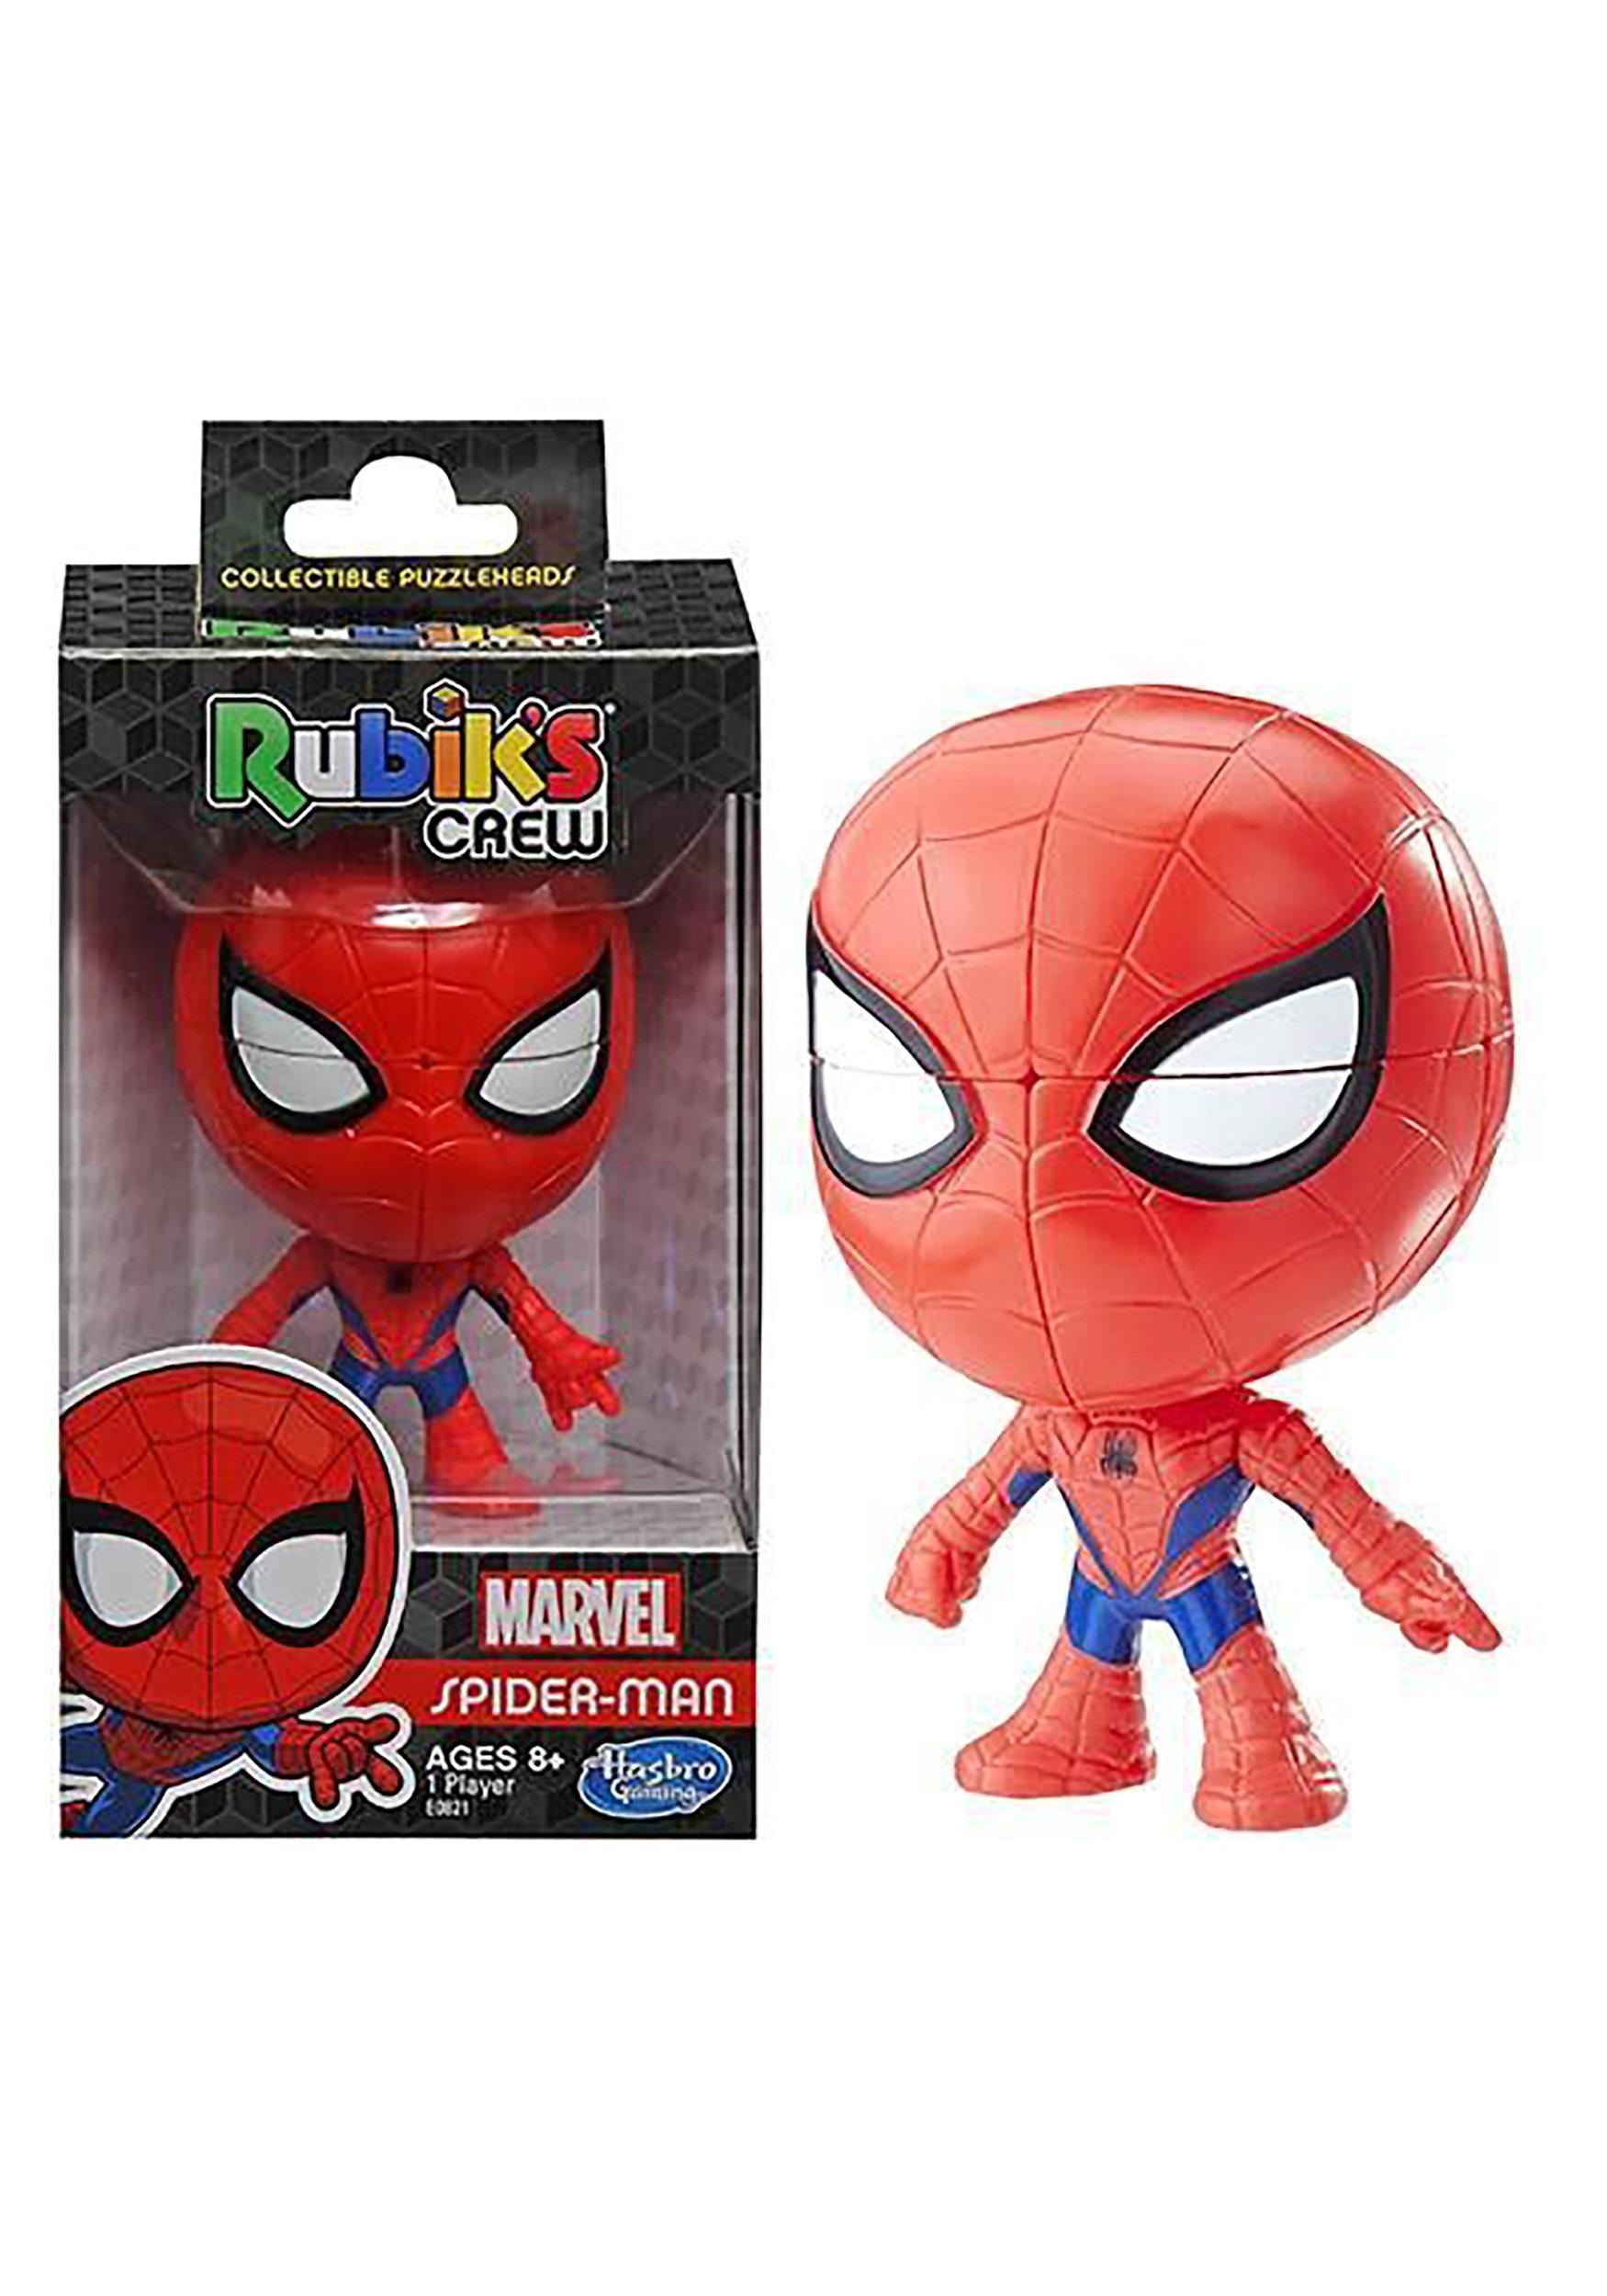 Rubiks Crew Game: Spider-Man Marvel Edition